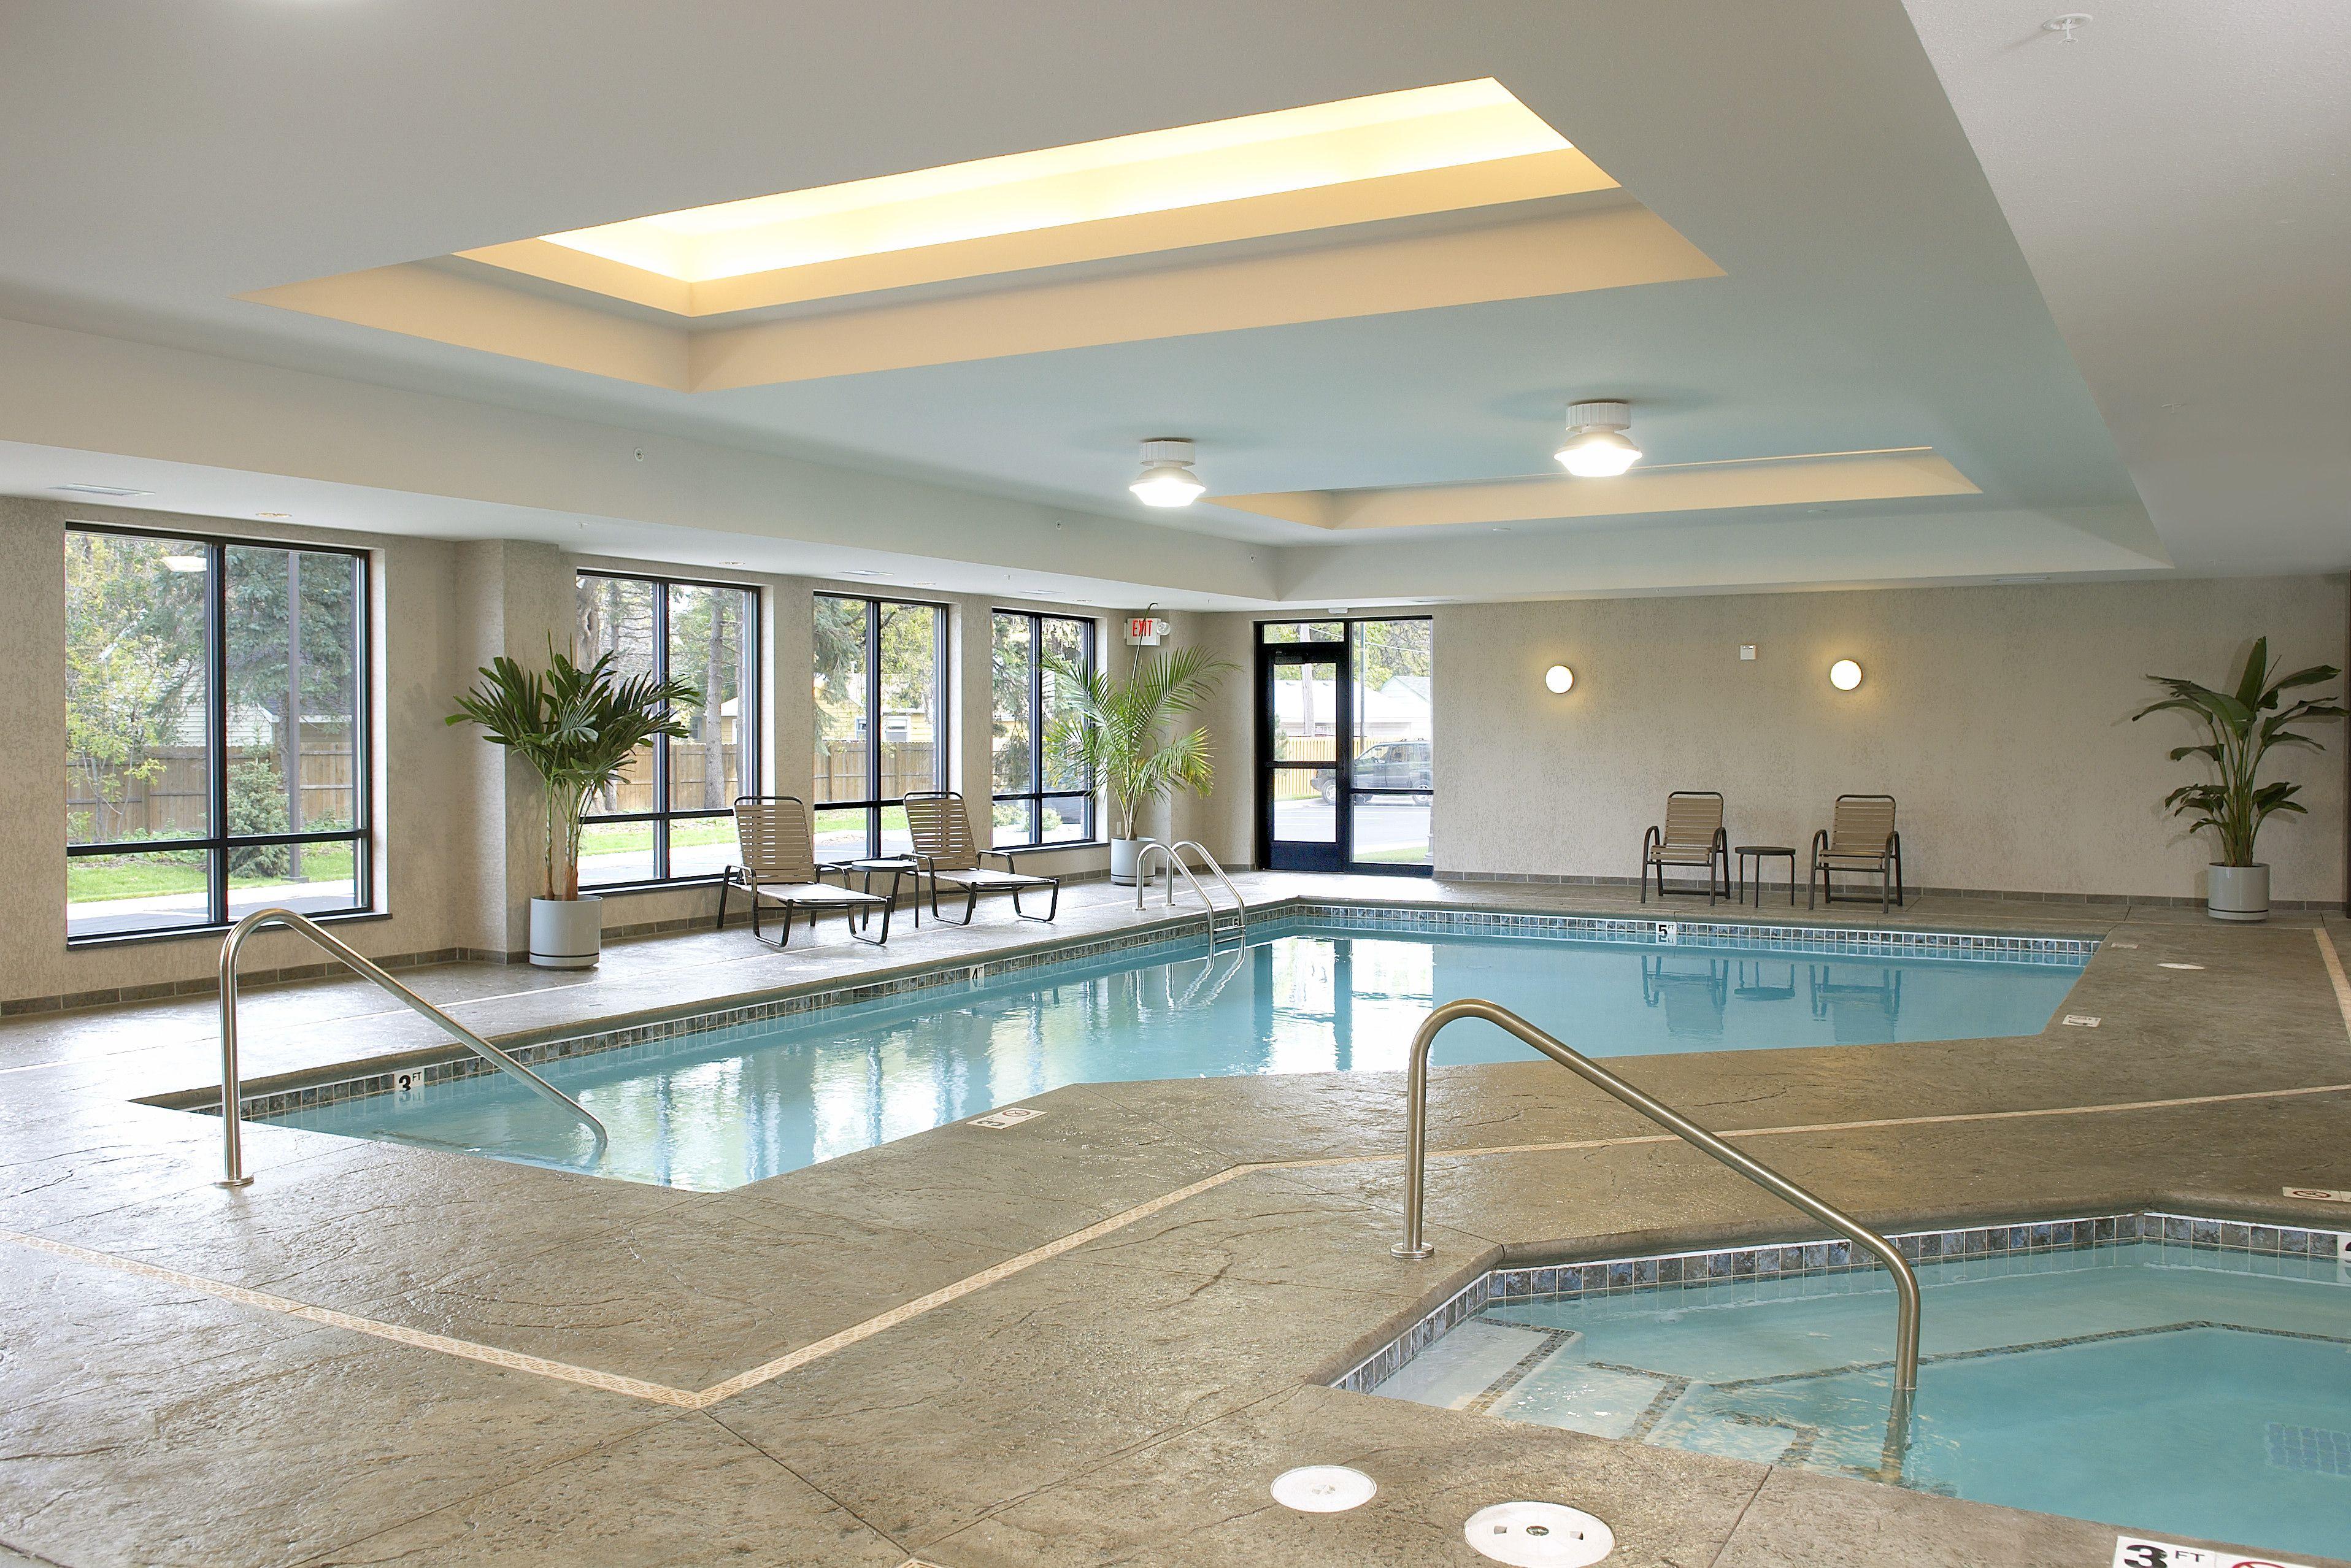 Indoor Pool At Hiawatha Flats Apartments In Minneapolis Mn Flat Apartment Apartment Indoor Pool